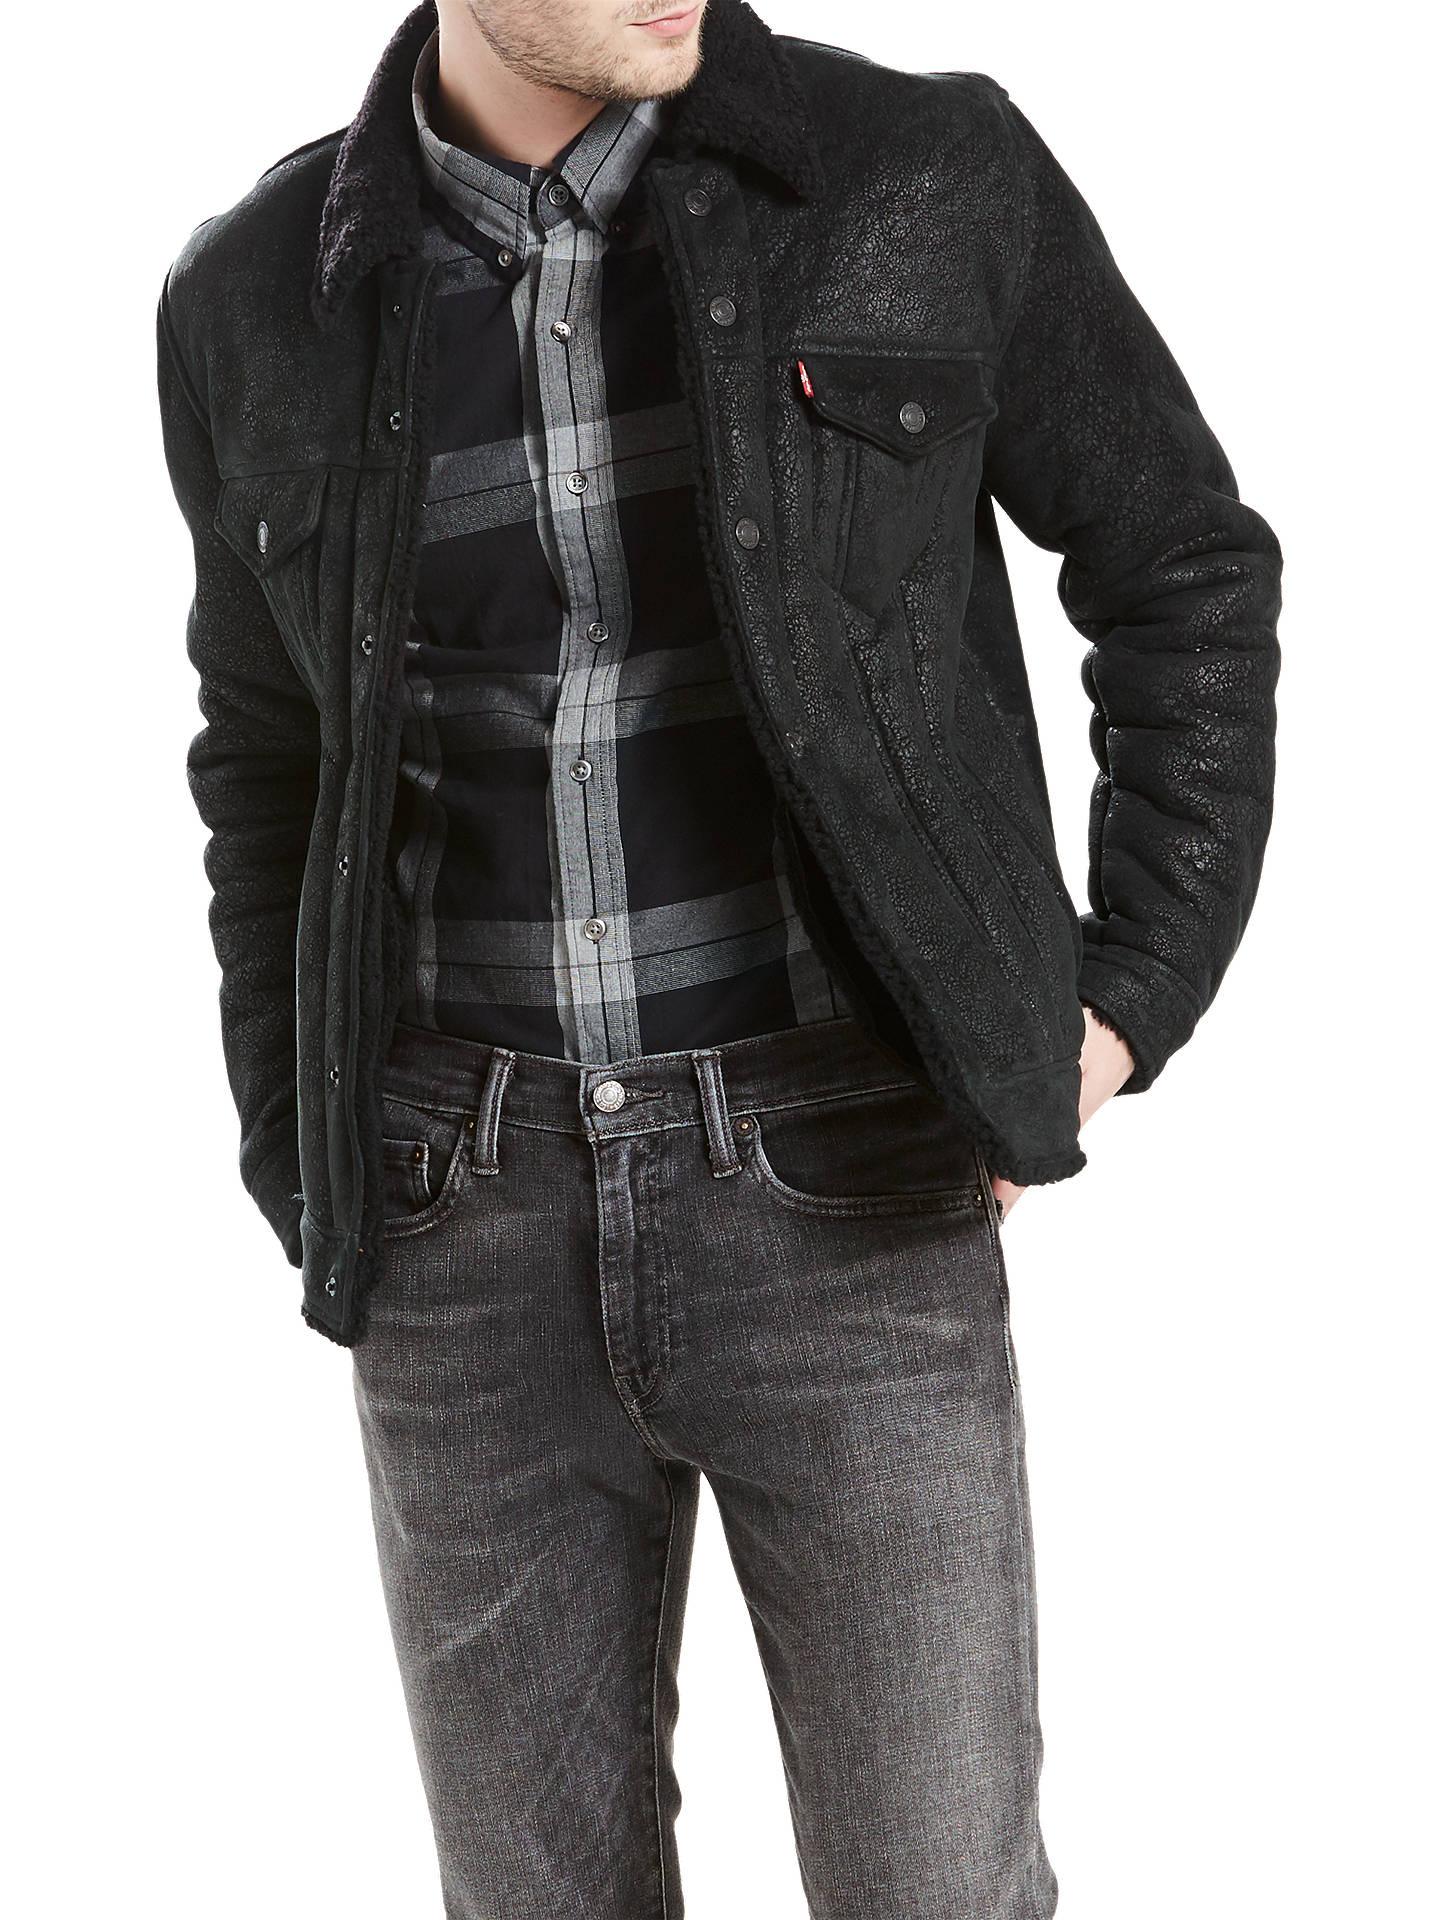 5847dc03c8b0 Buy Levi's Shearling Trucker Jacket, Black, S Online at johnlewis. ...